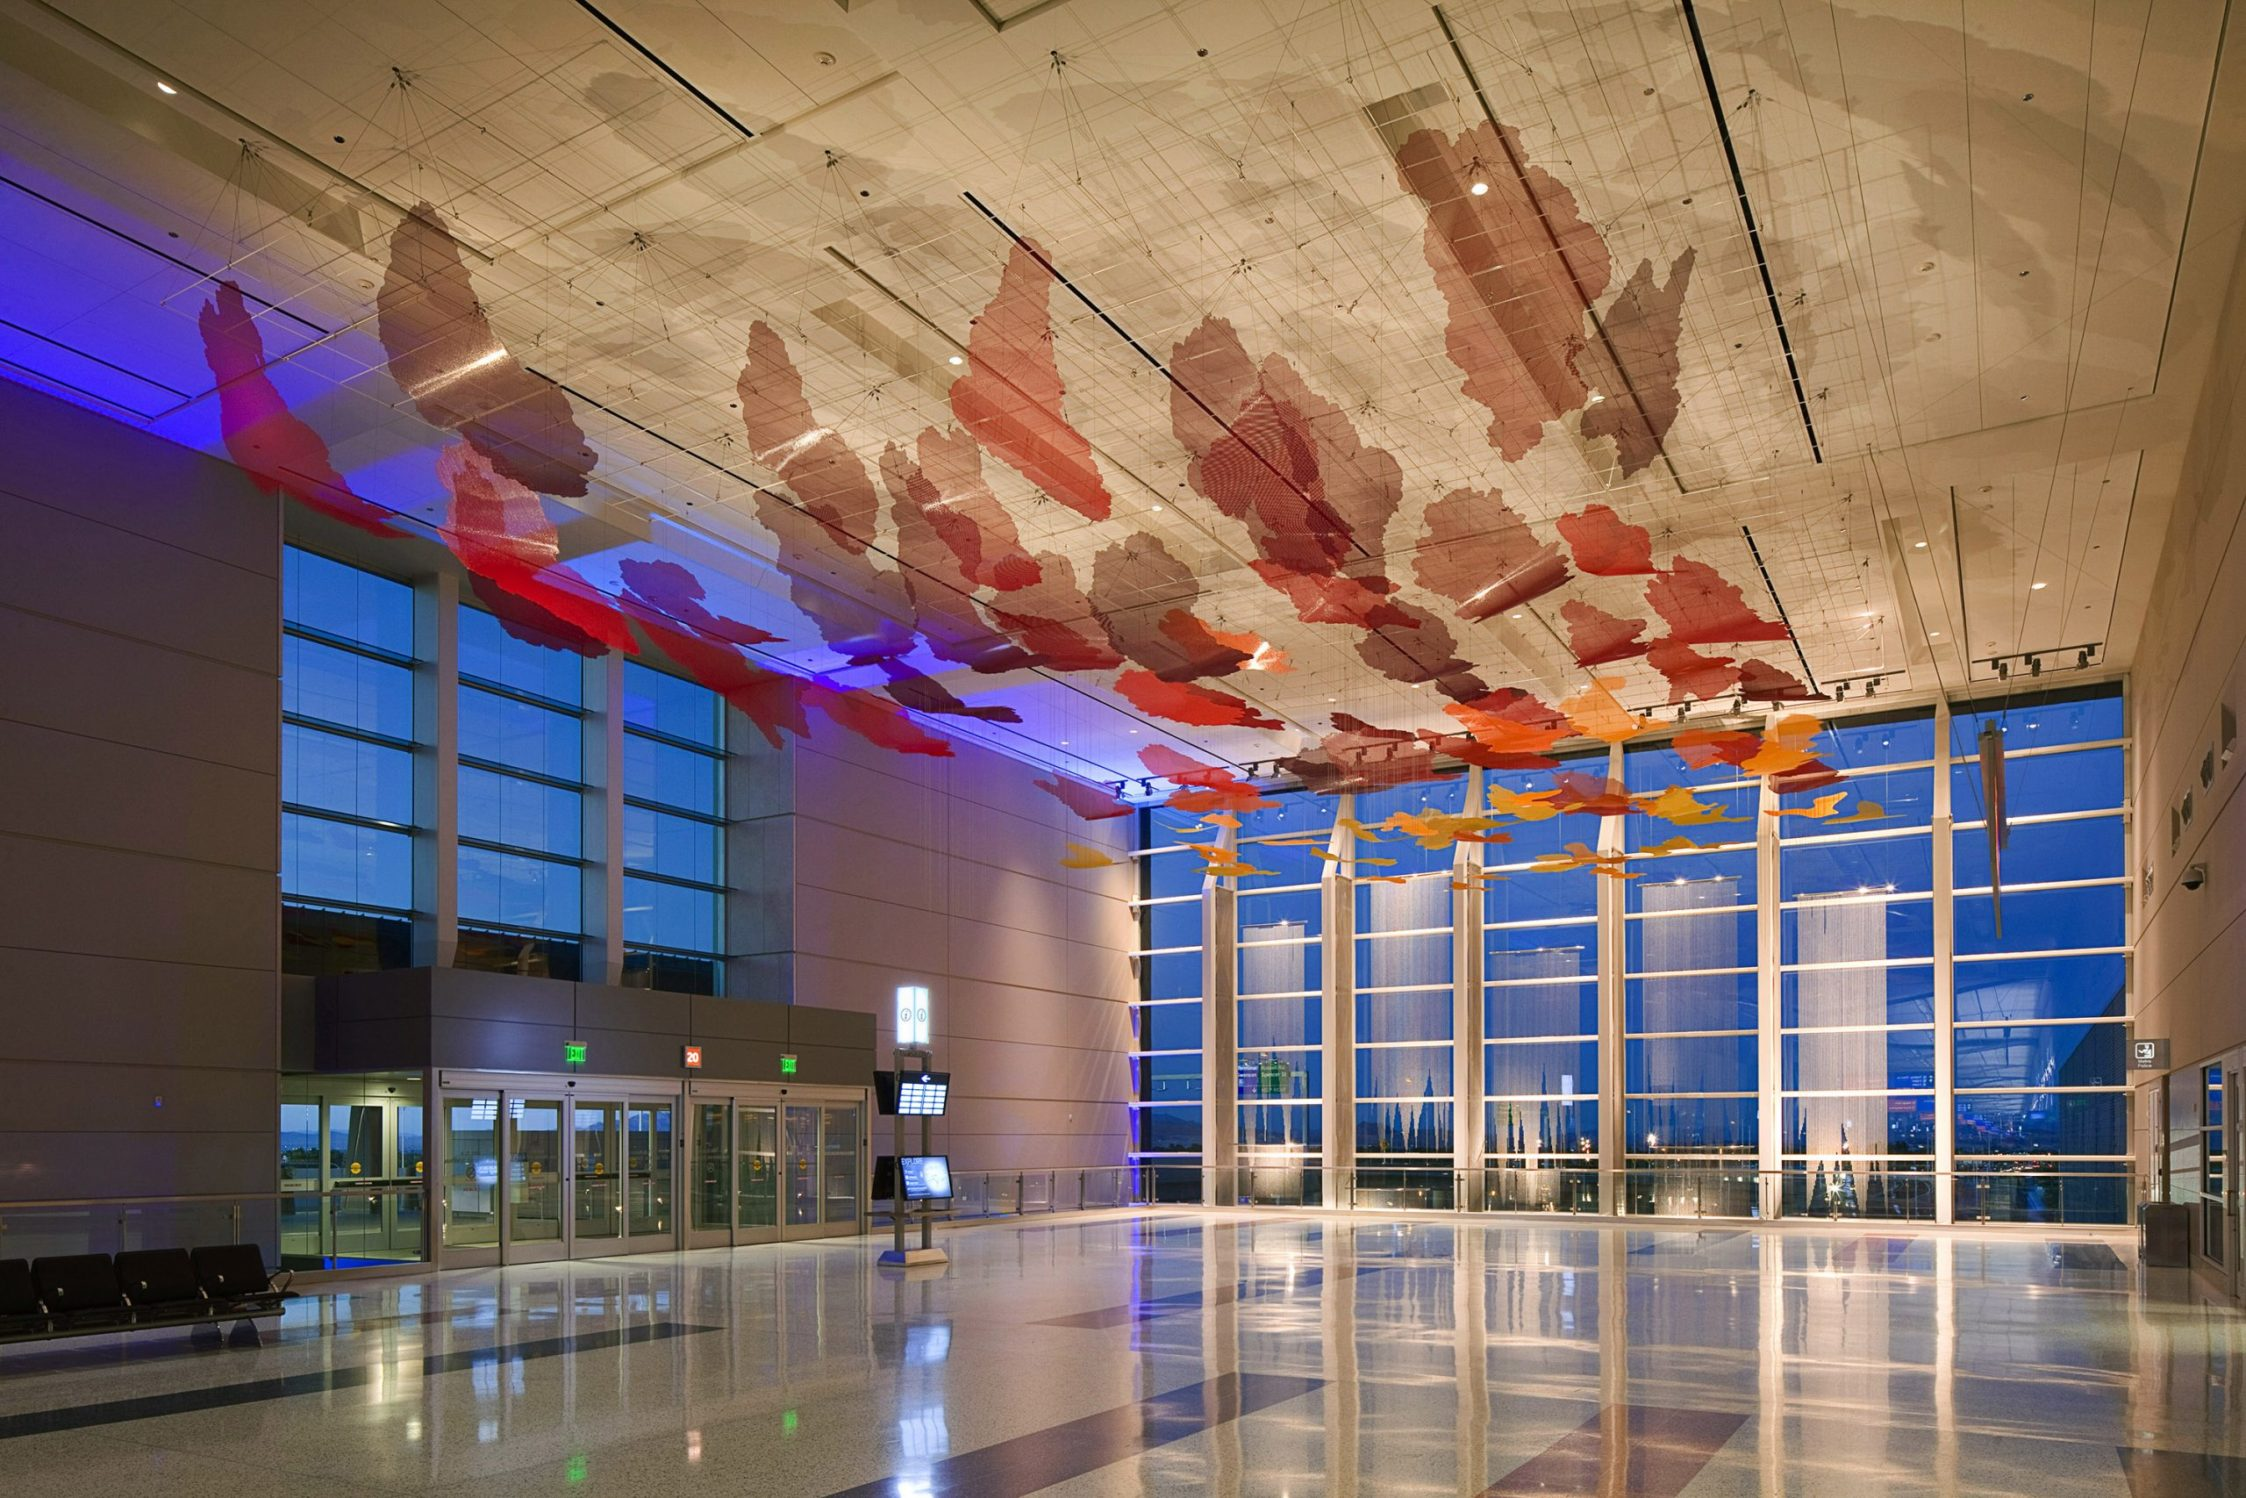 Desert Sunrise suspended sculpture in McCarran International Airport.